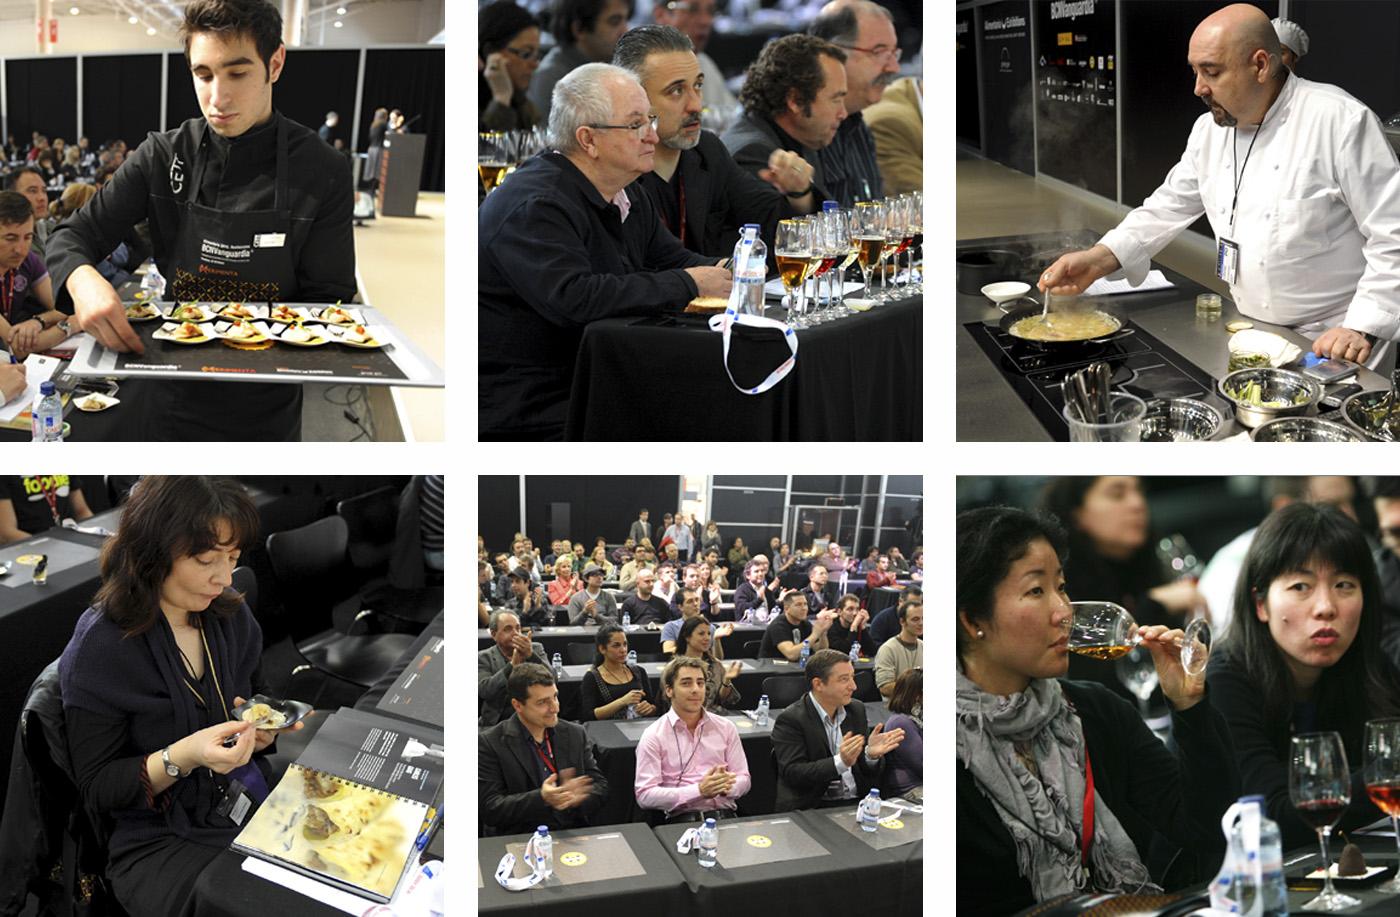 arzak-BCNVanguardia-alimentariagastronomia-cheff-evento-stand-creartiva